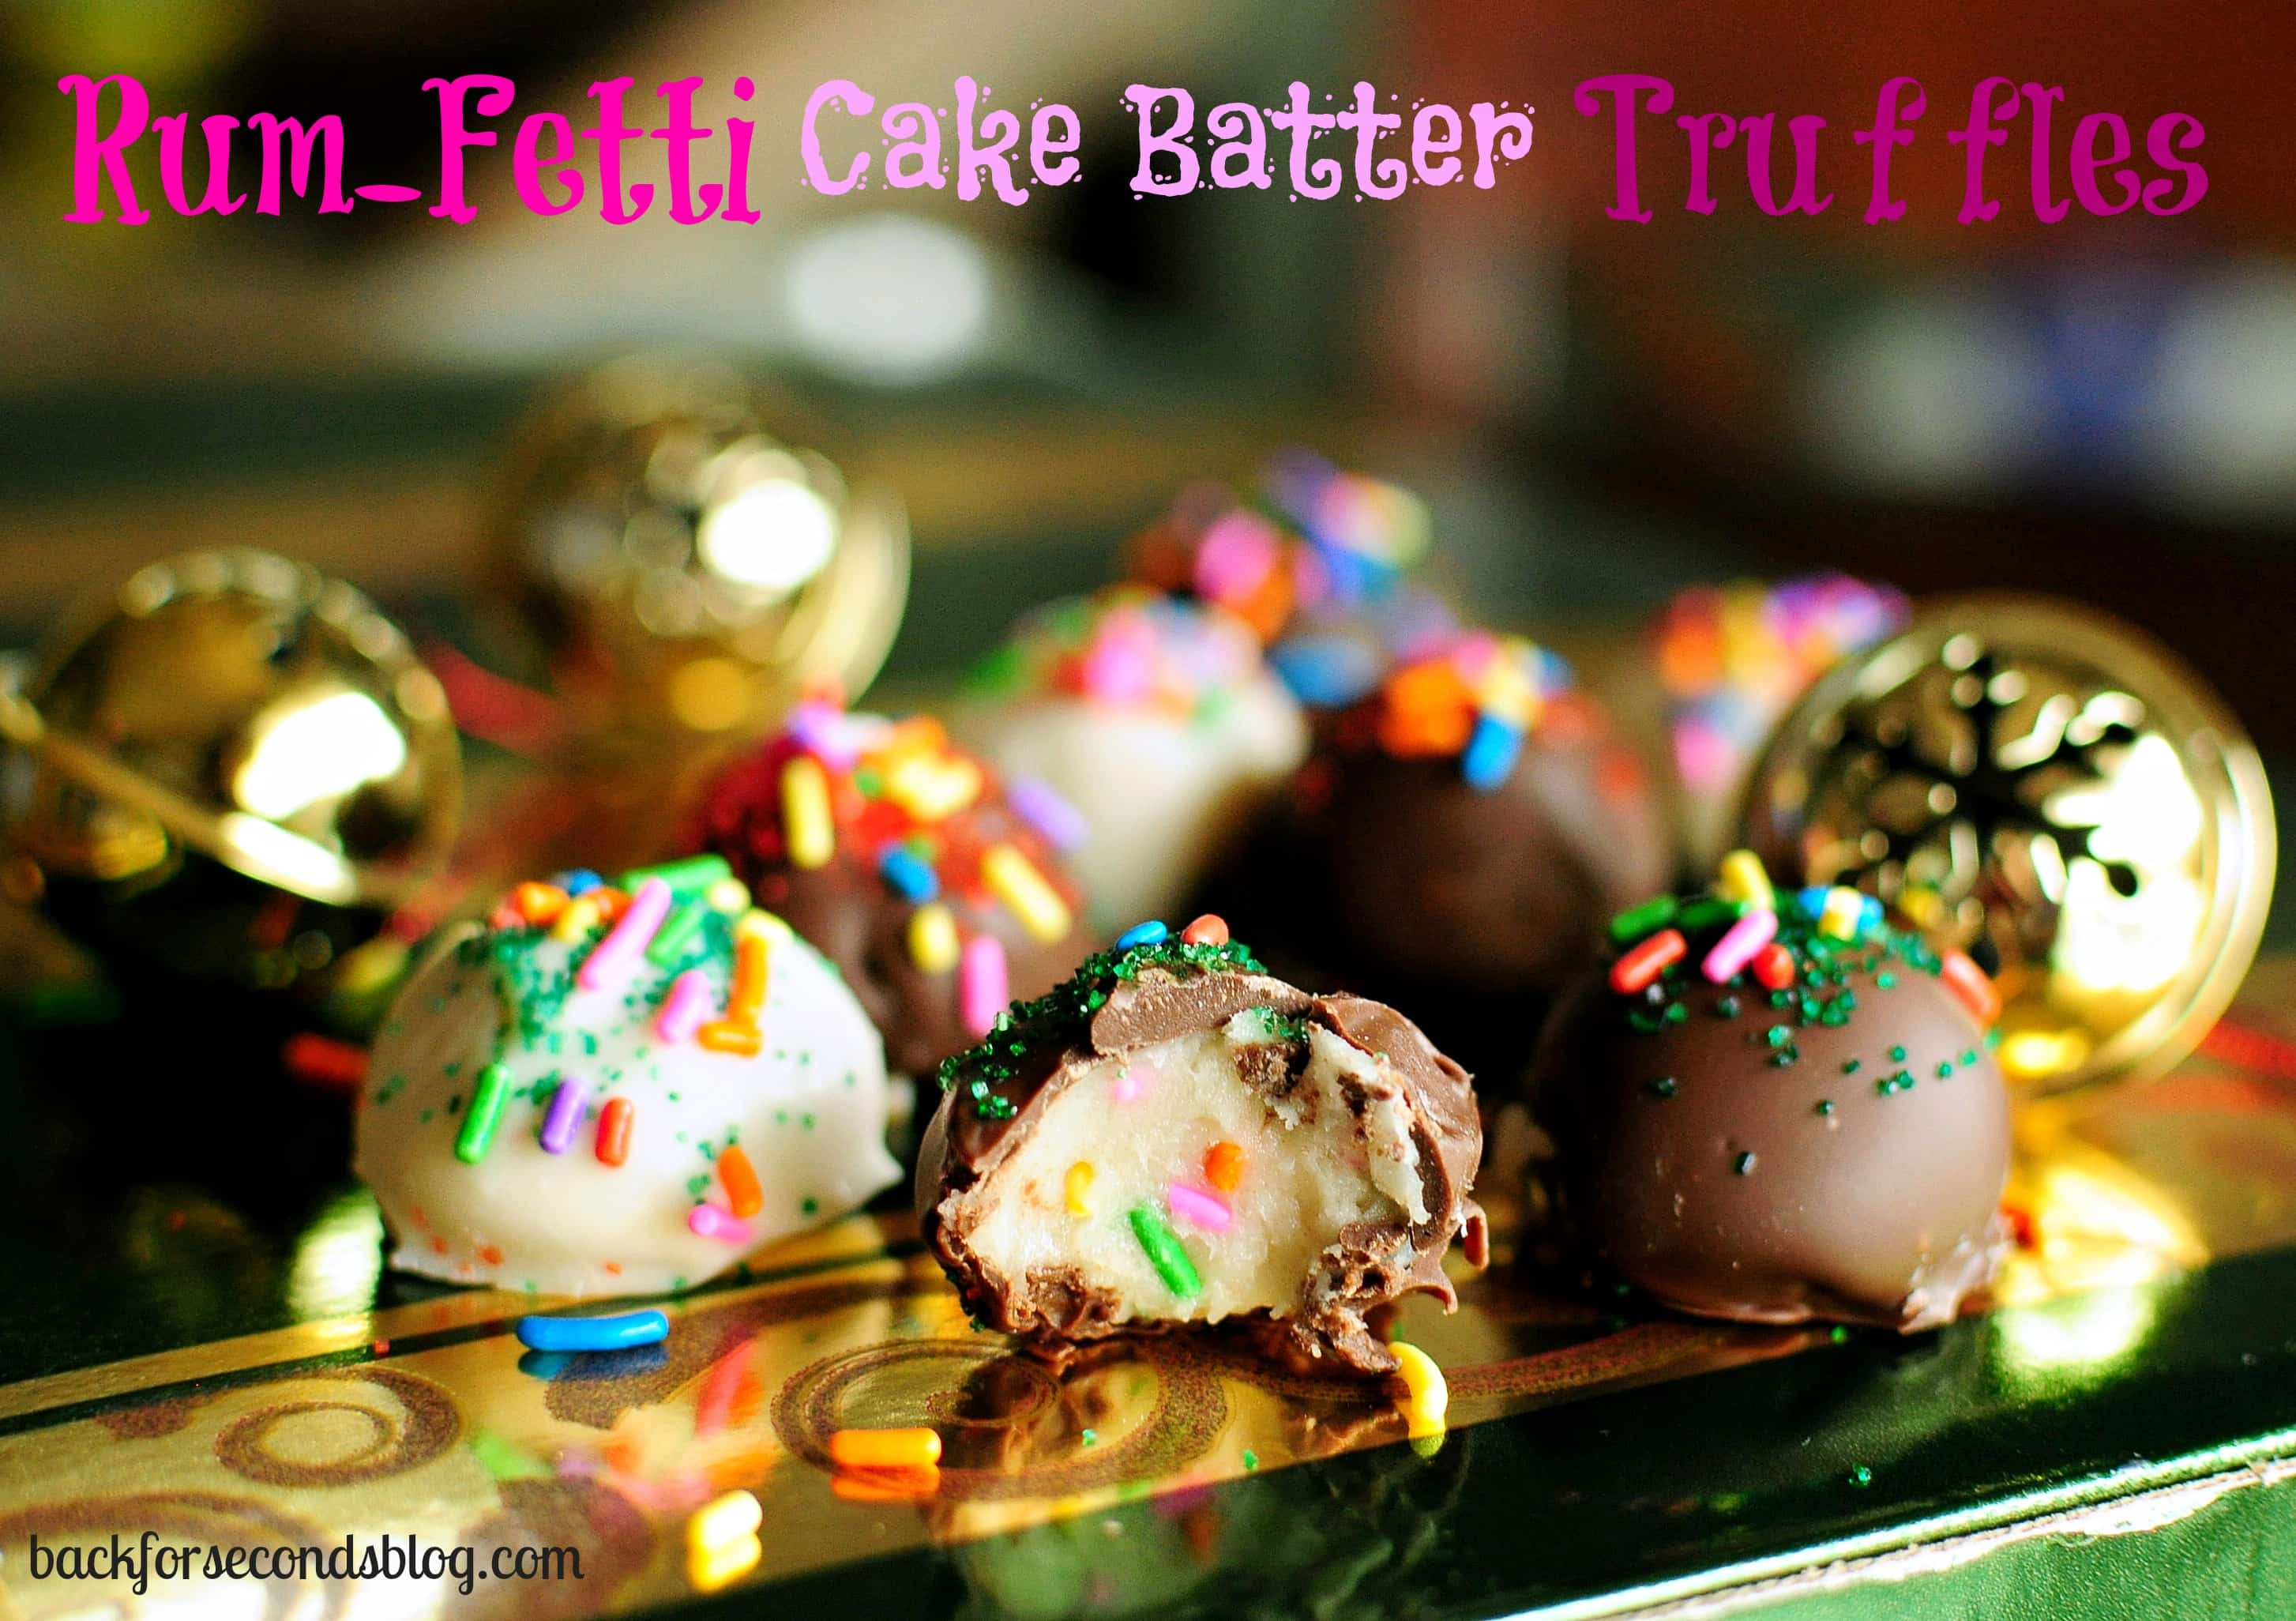 Rum-Fetti Cake Batter Truffles - Easy no bake cake batter truffles made from scratch...with rum!! http://backforseconds.com #funfetti #cakebatter #truffles